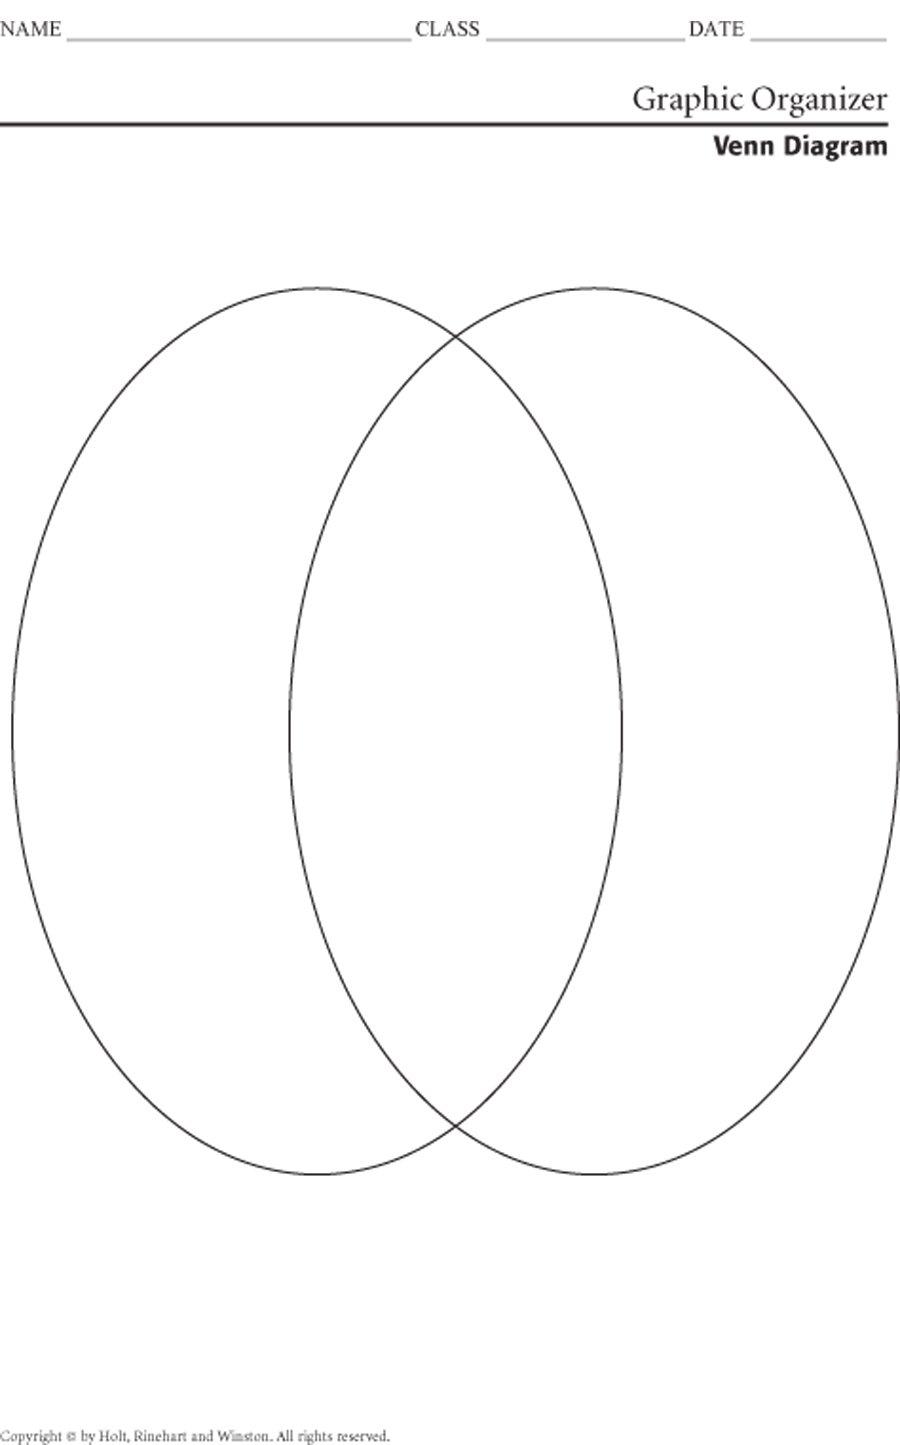 Venn Diagram Printable 40 Free Venn Diagram Templates Word Pdf Template Lab